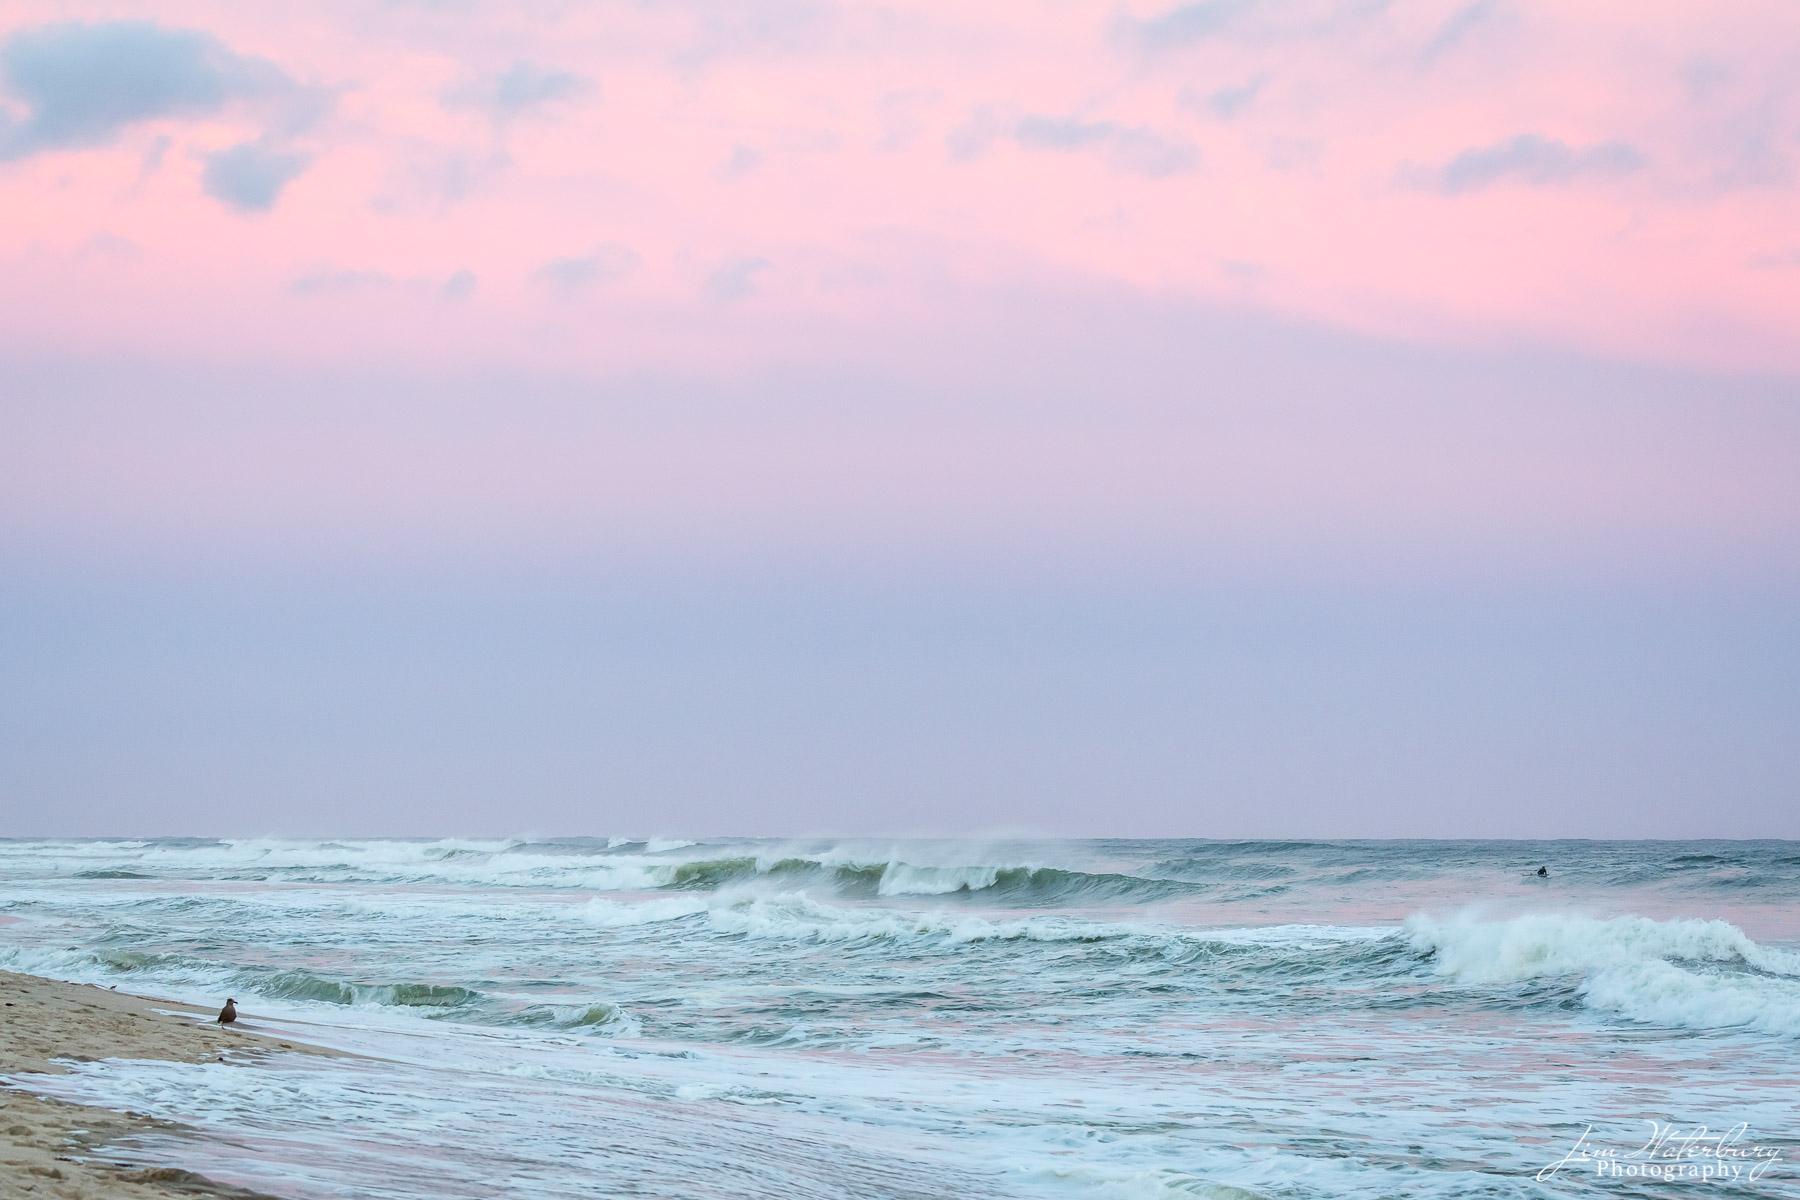 beach, wave, pastel, sky, ocean, surf, photo